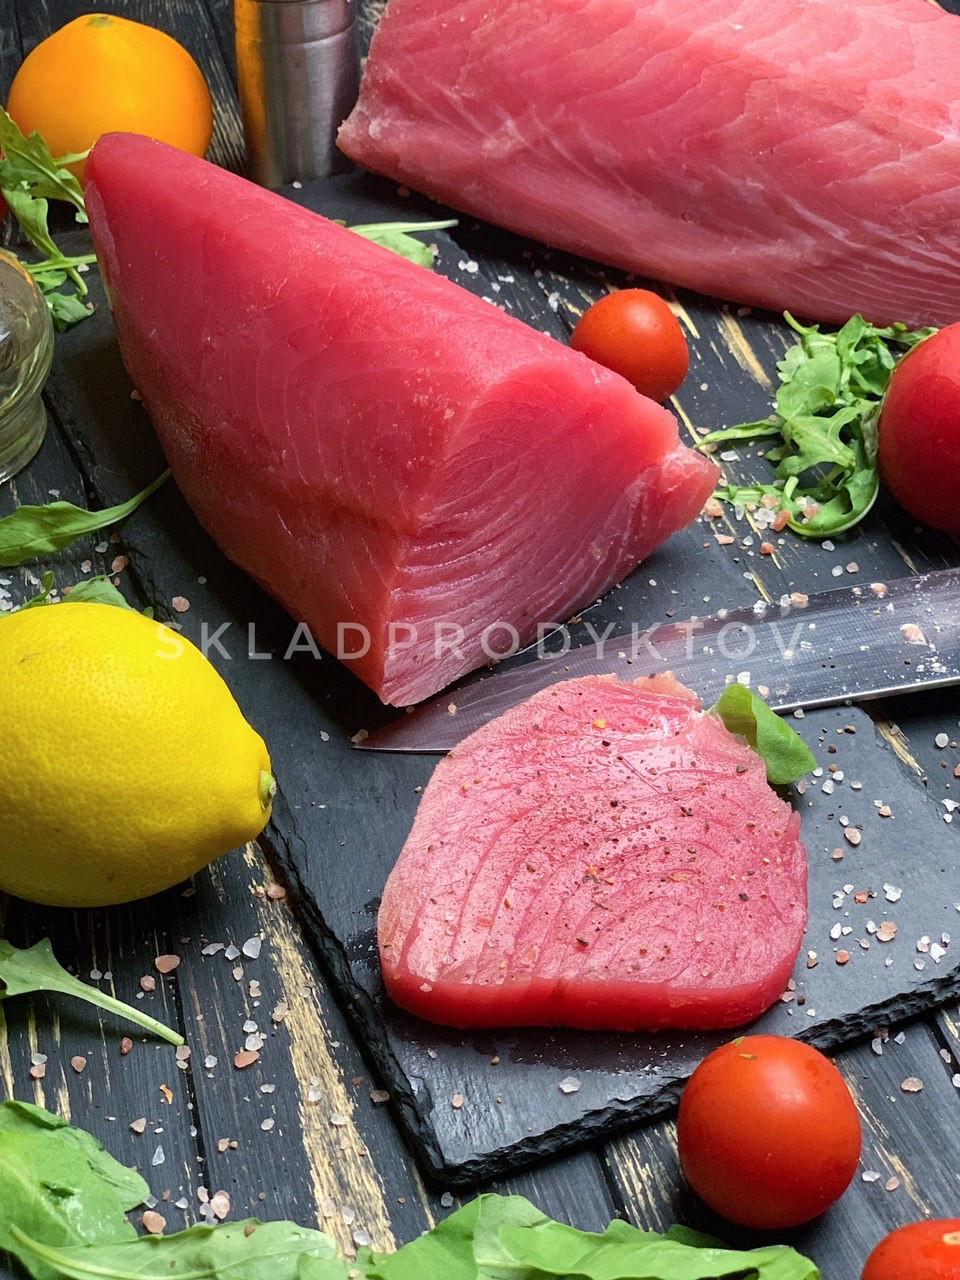 Балик тунця(хвостова частина) Instagram: skladprodyktov_ukraine